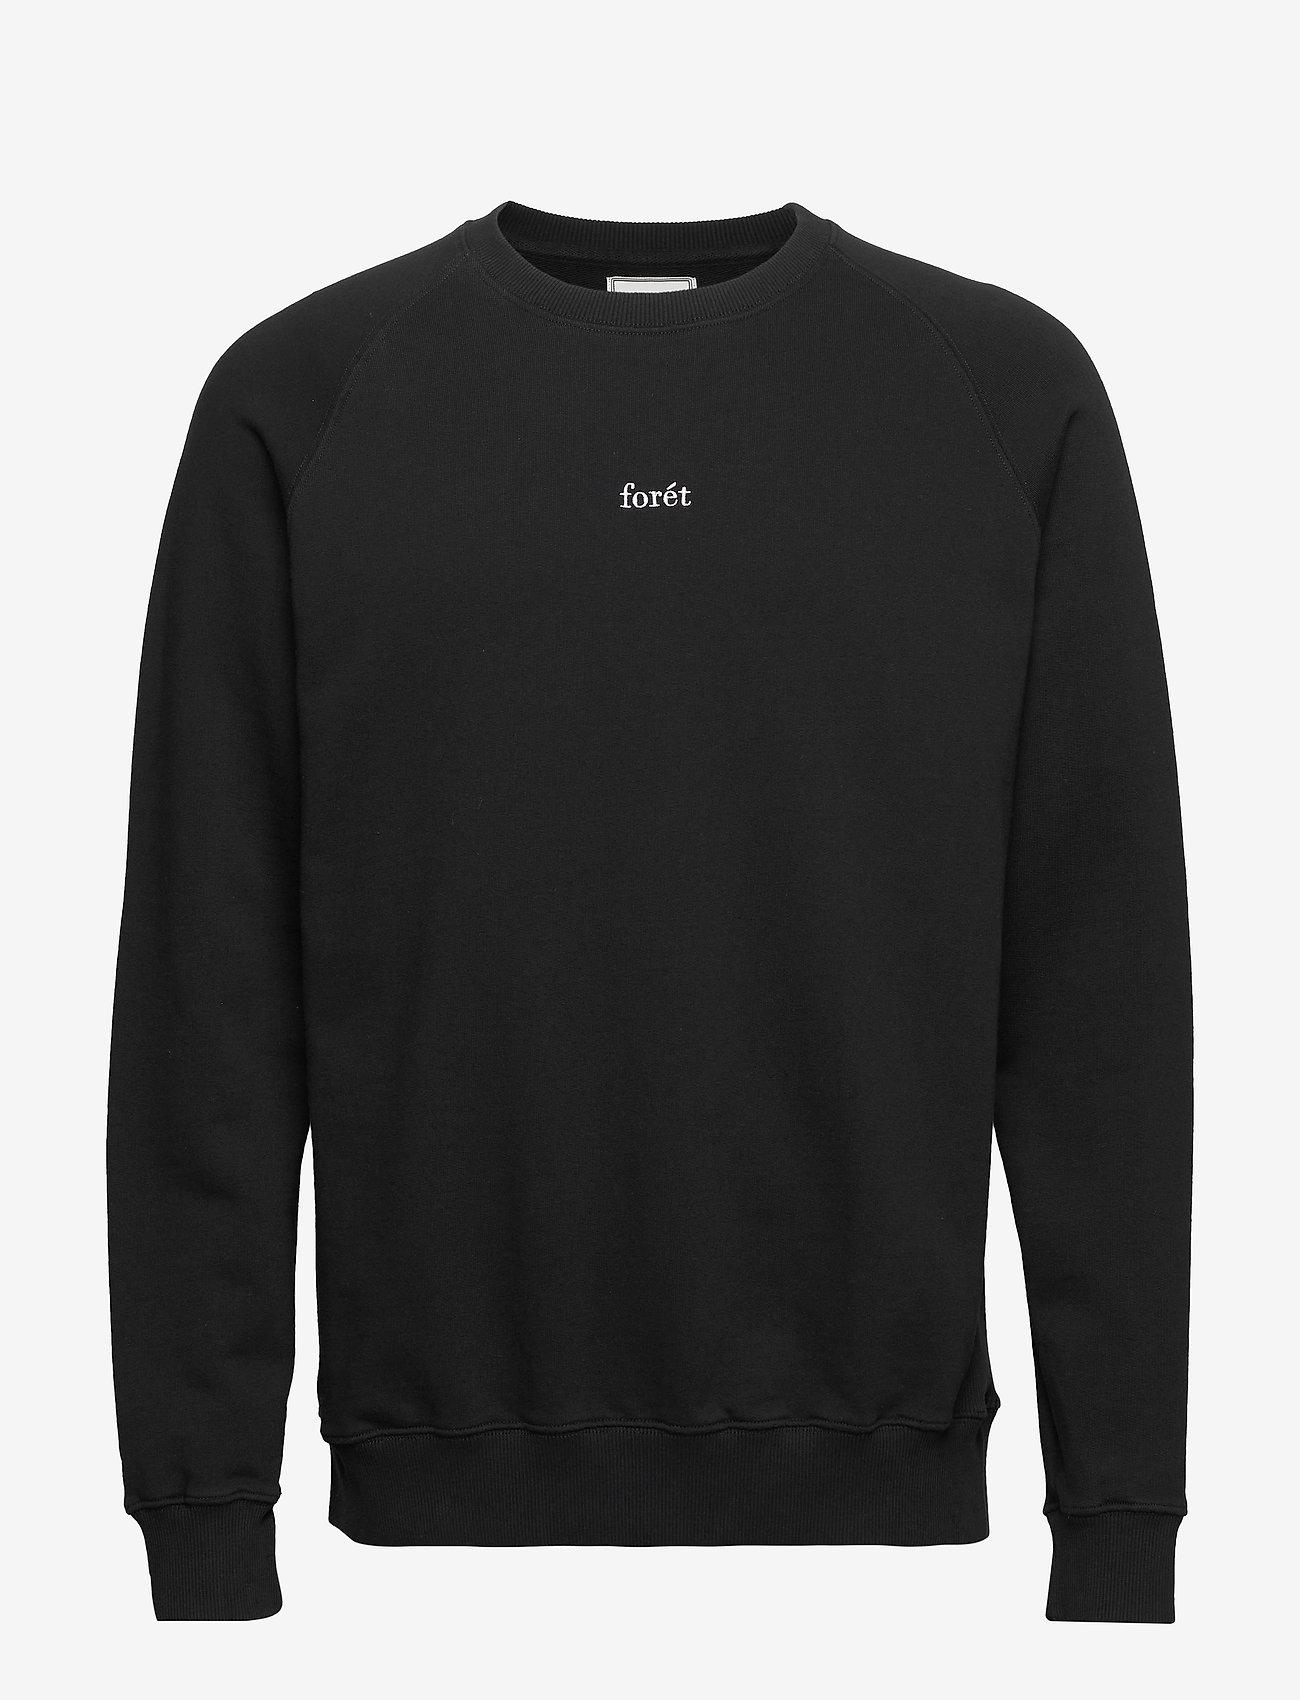 Forét - OX SWEATSHIRT - basic-sweatshirts - black - 0